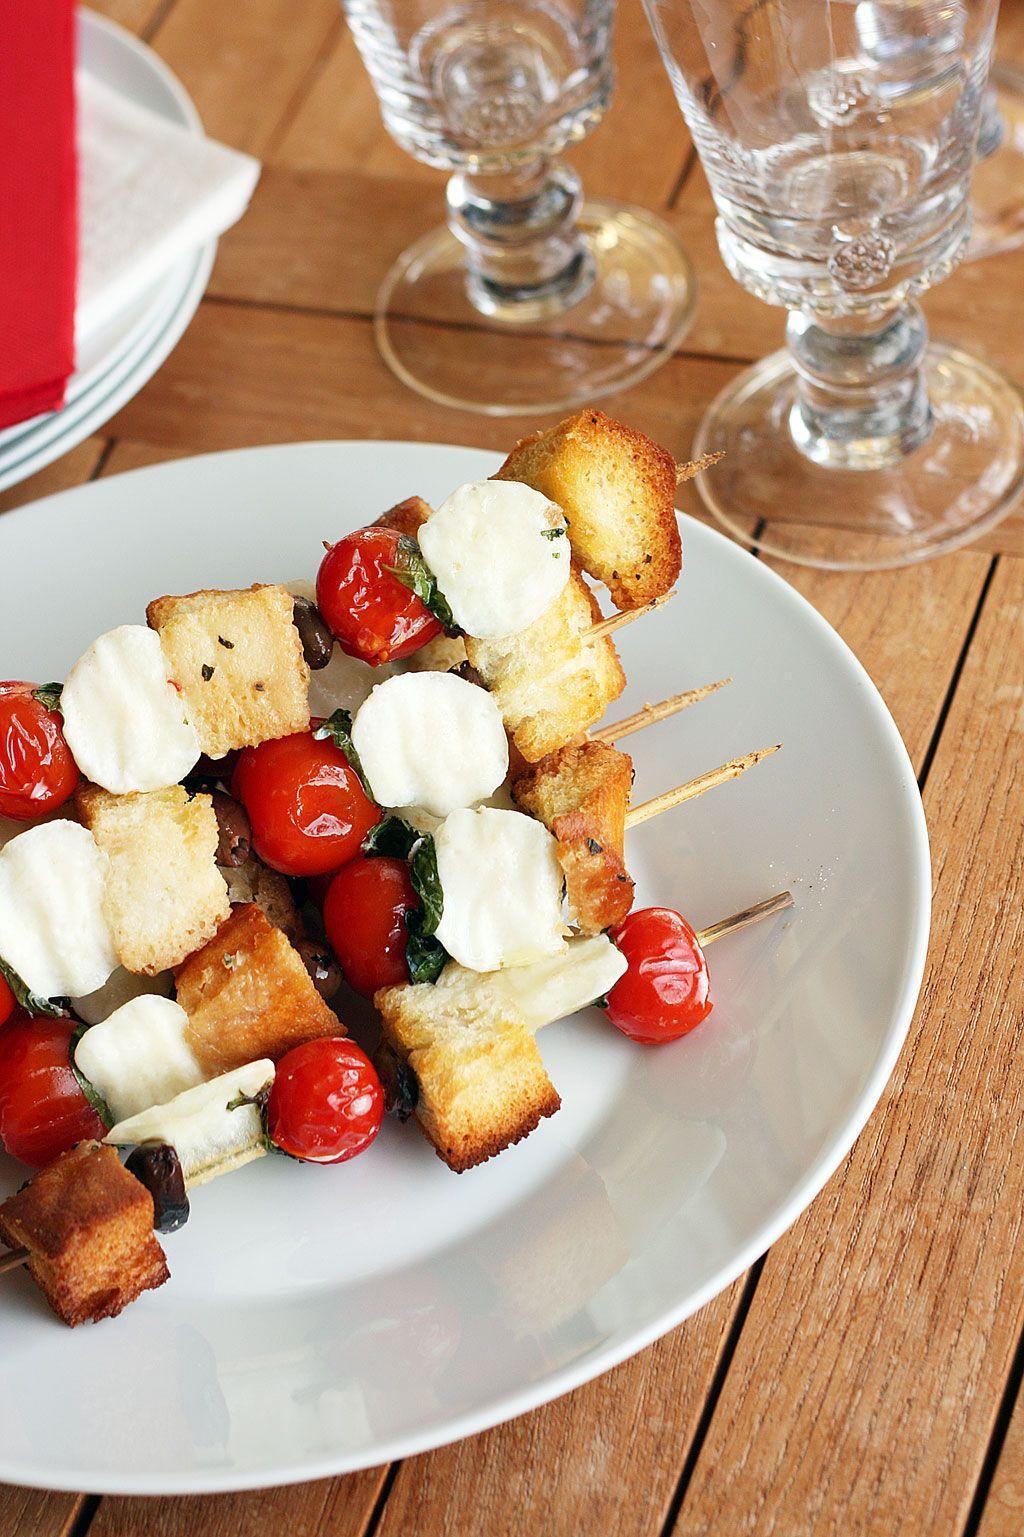 A Savory Italian Appetizer Italian Chips Italian Appetizers Yummy Appetizers Recipes